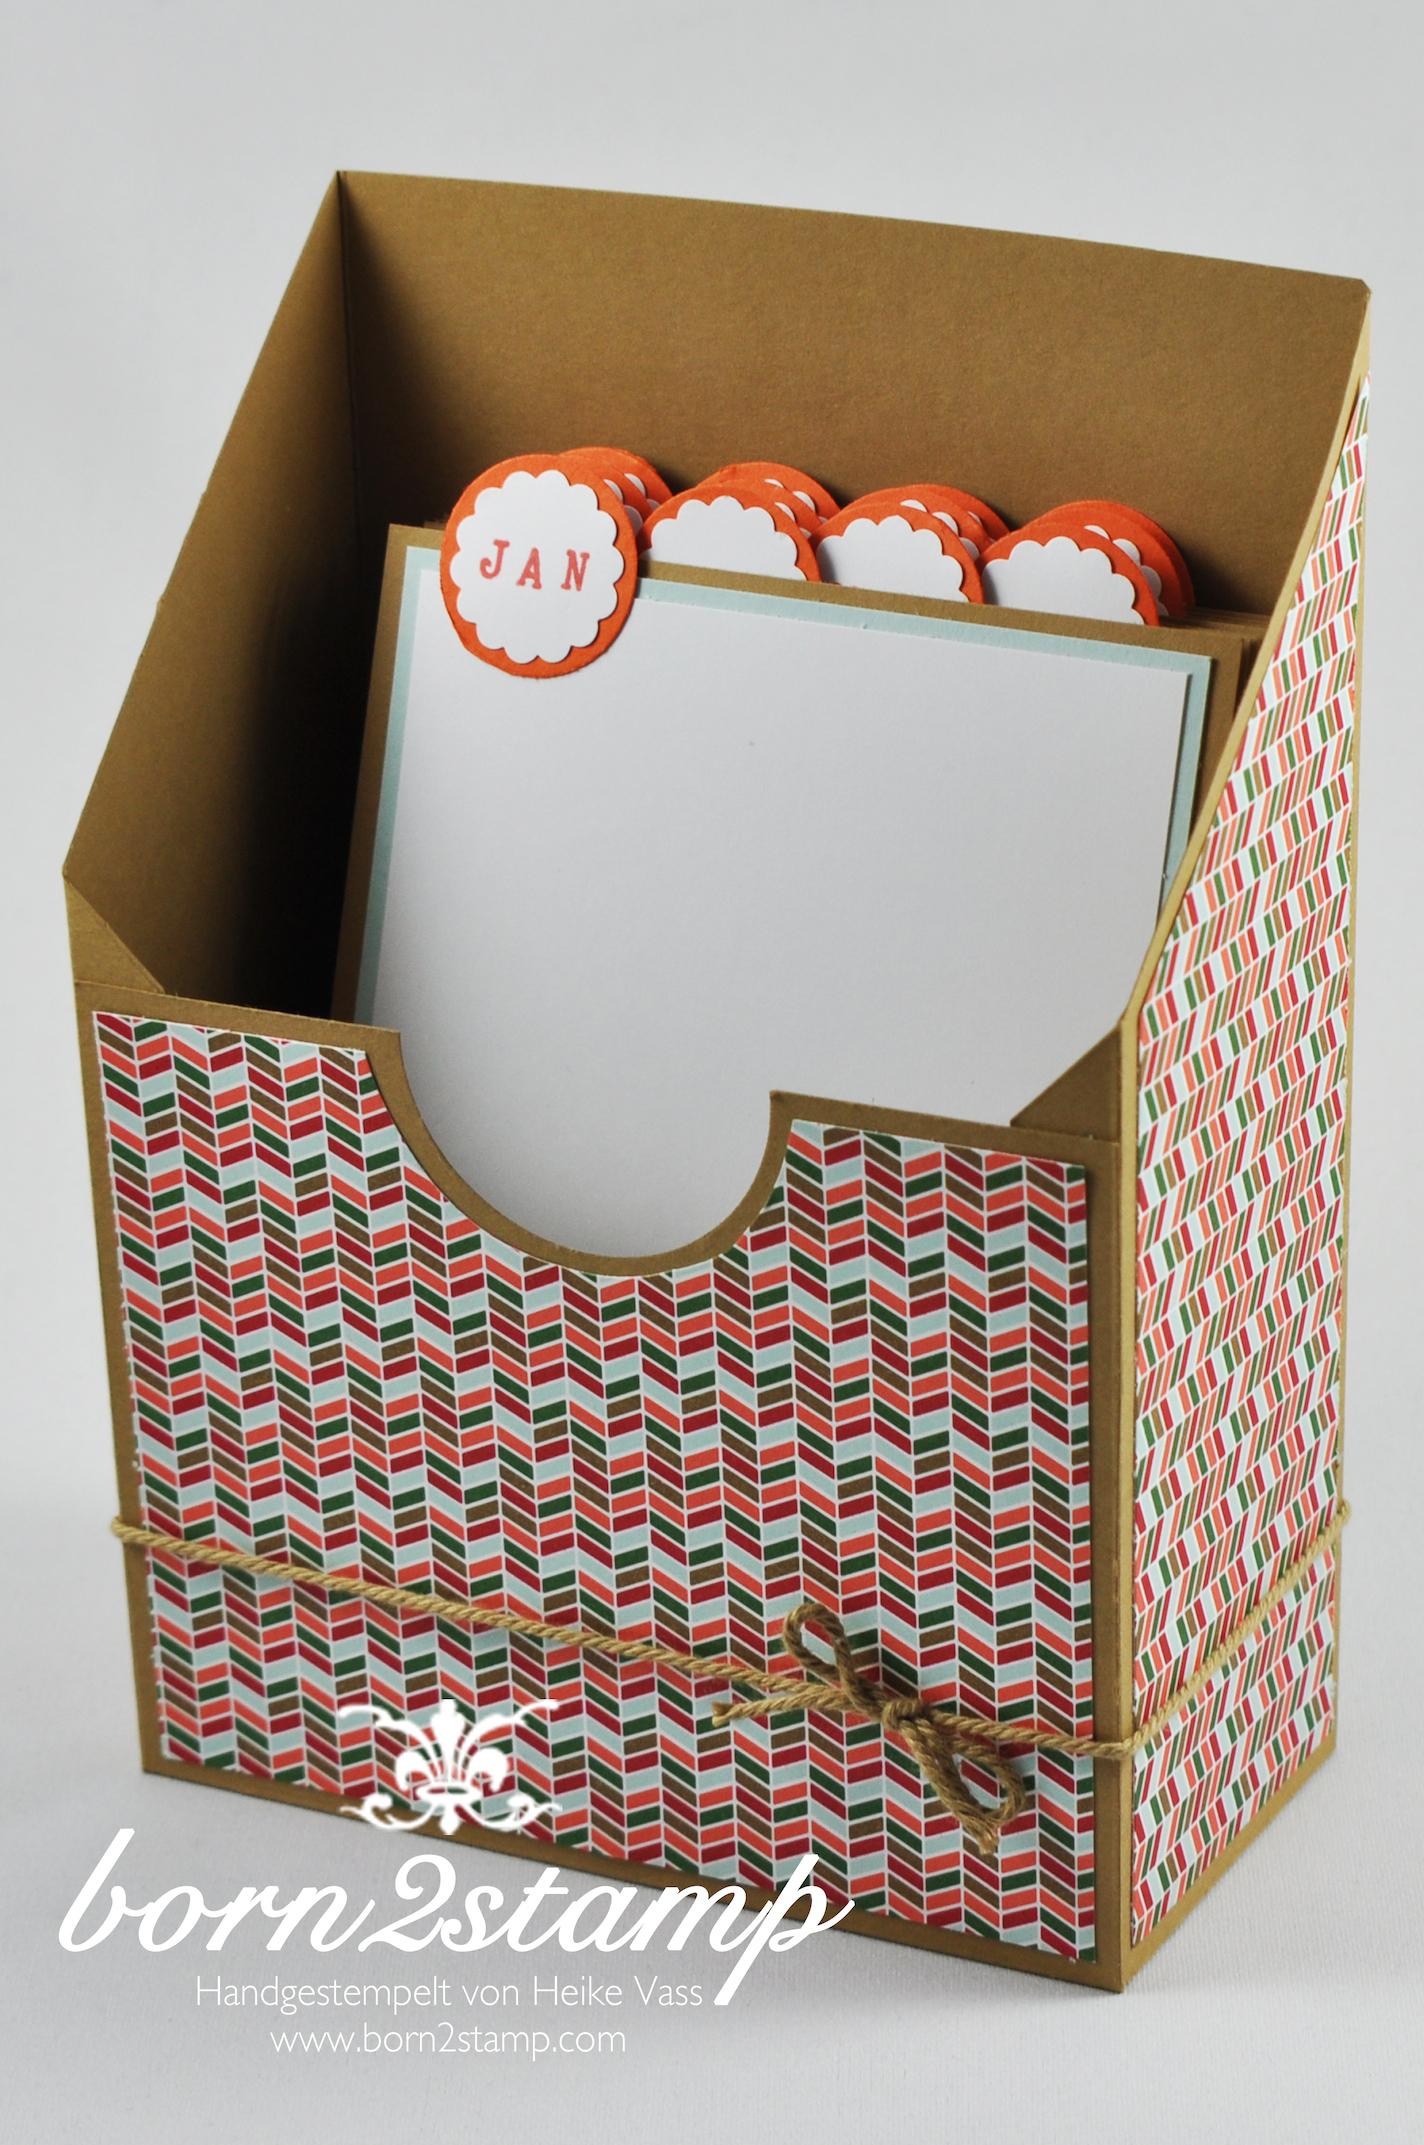 STAMPIN' UP! Geburtstagskartenbox DSP Nordische Weihnacht Kreisstanze Wellenkreisstanze dicke Kordel